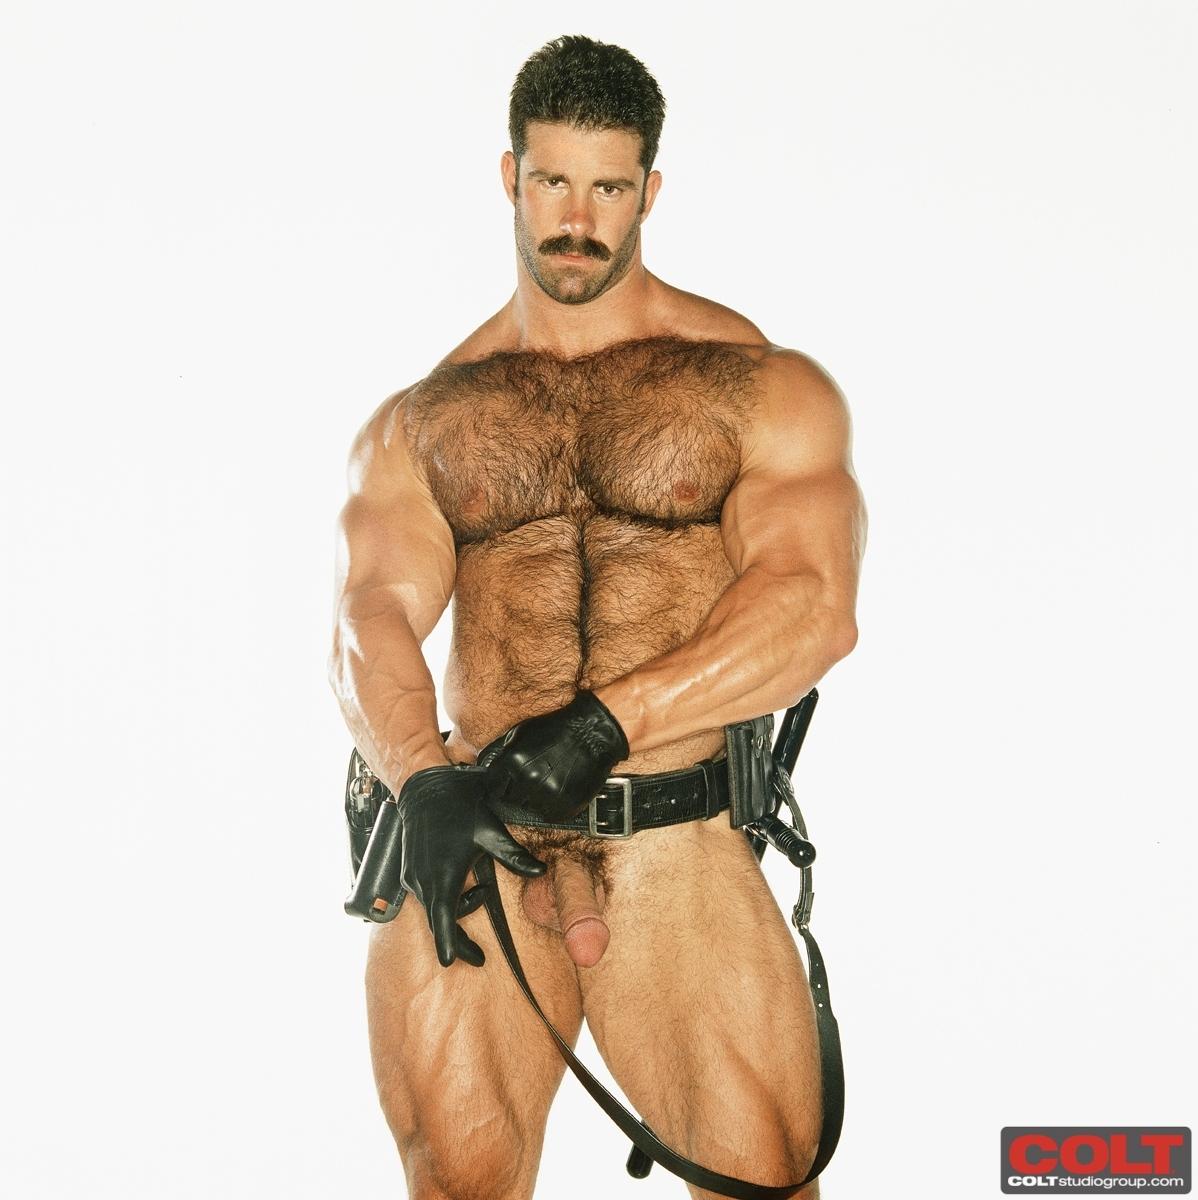 Pete Kuzak vintage gay hot daddy dude men porn